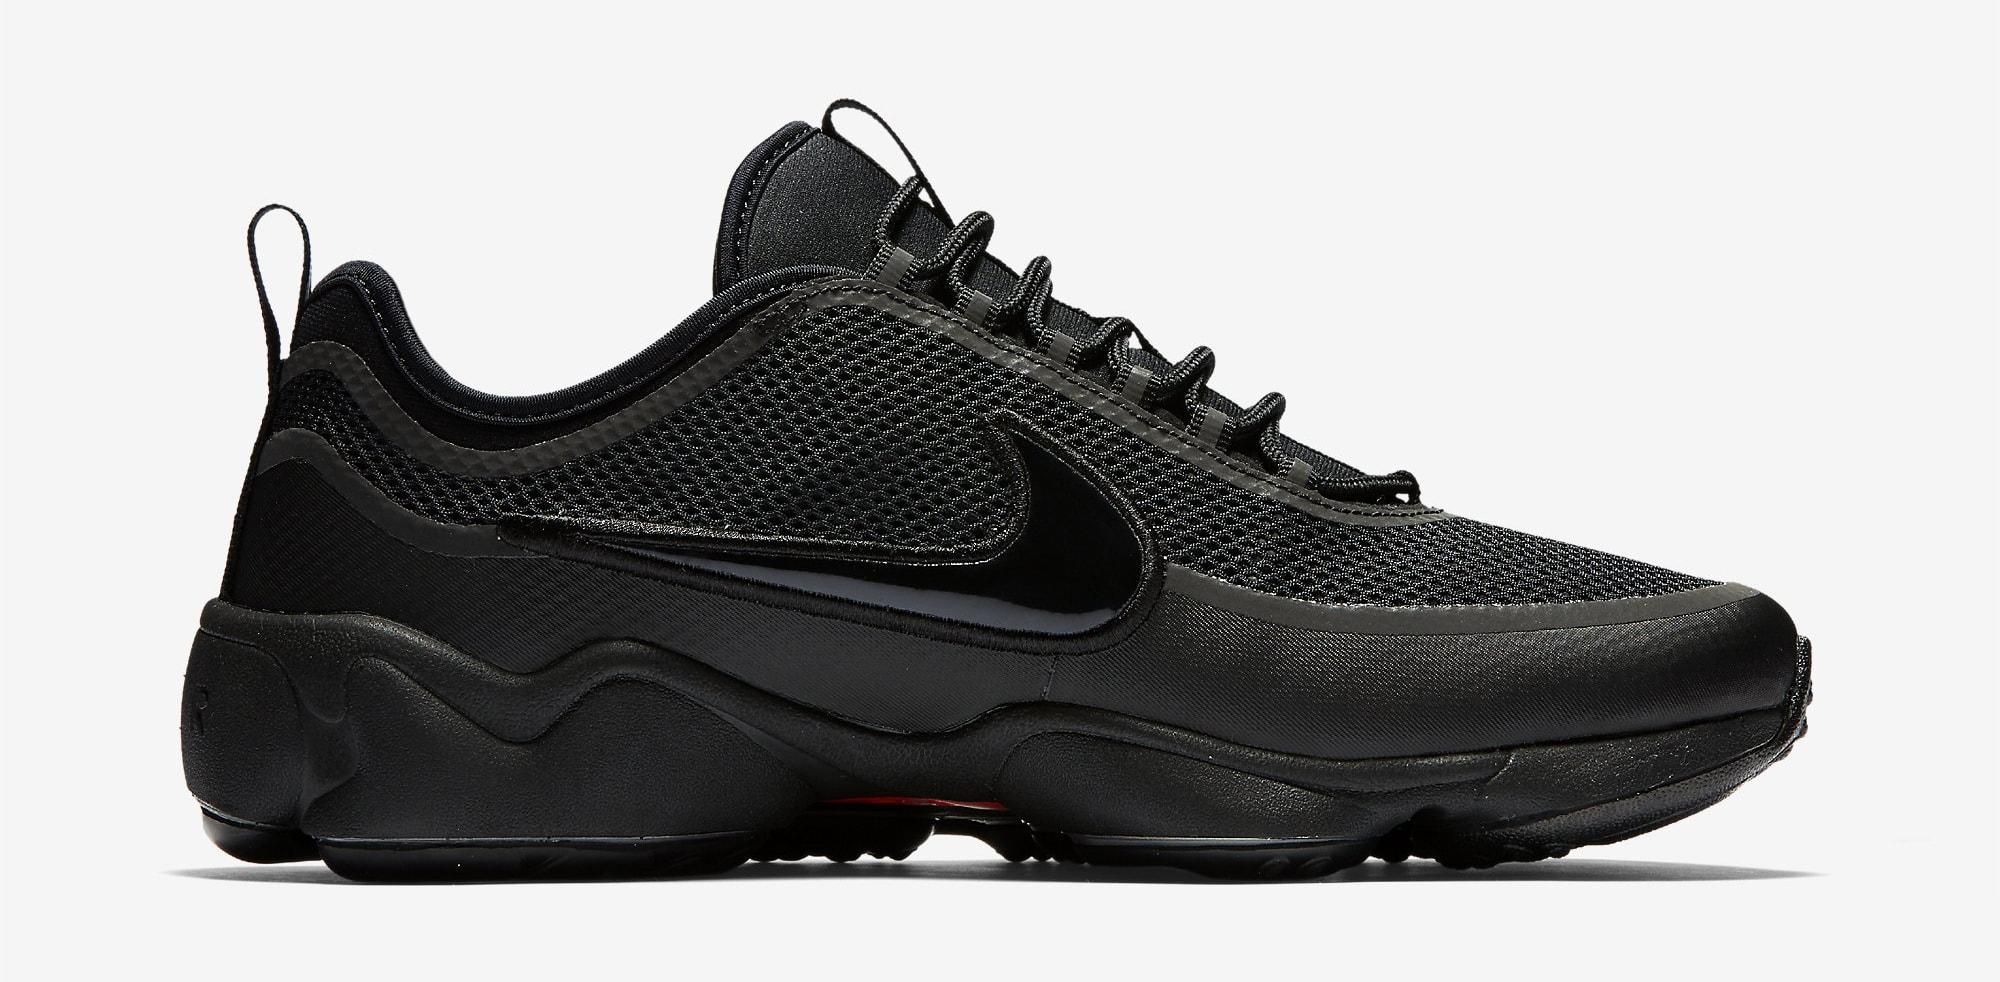 Nike Zoom Spiridon Ultra Black 876267-002 Medial